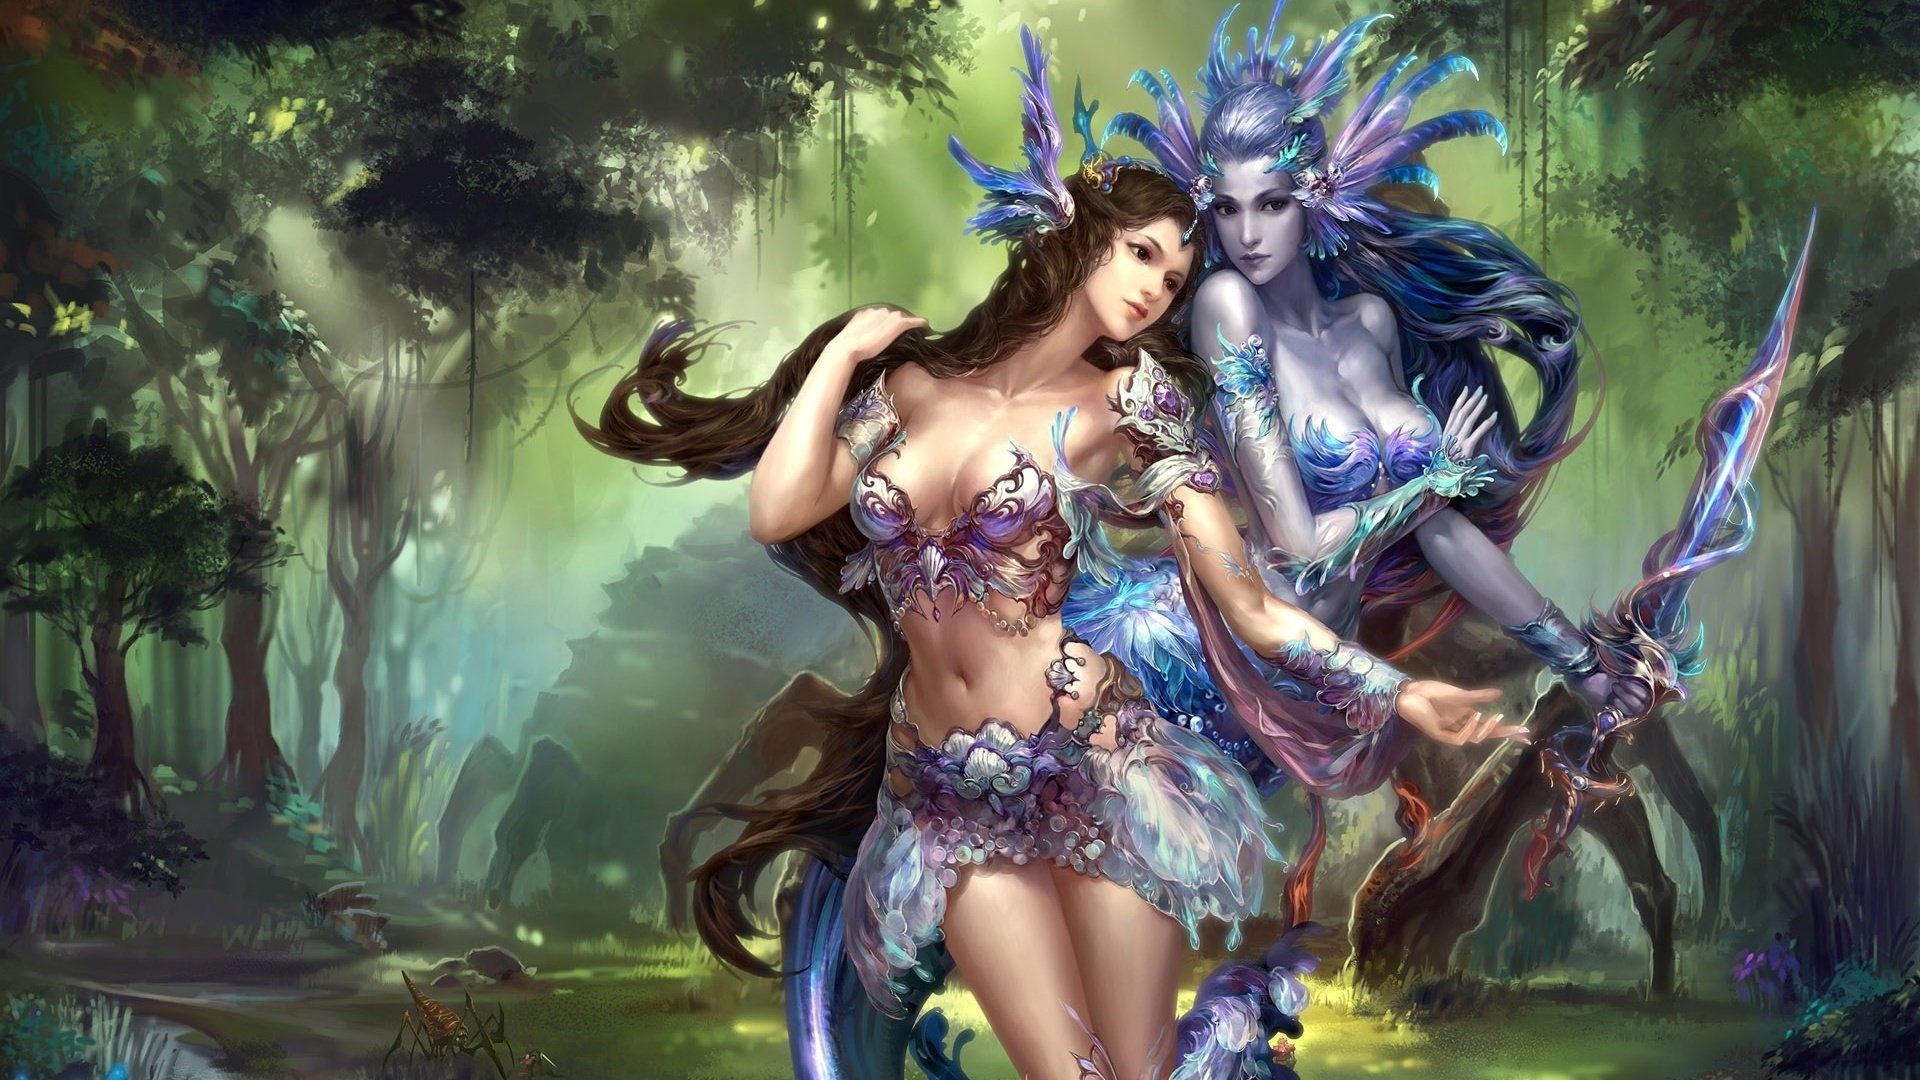 Fairy Background Wallpaper